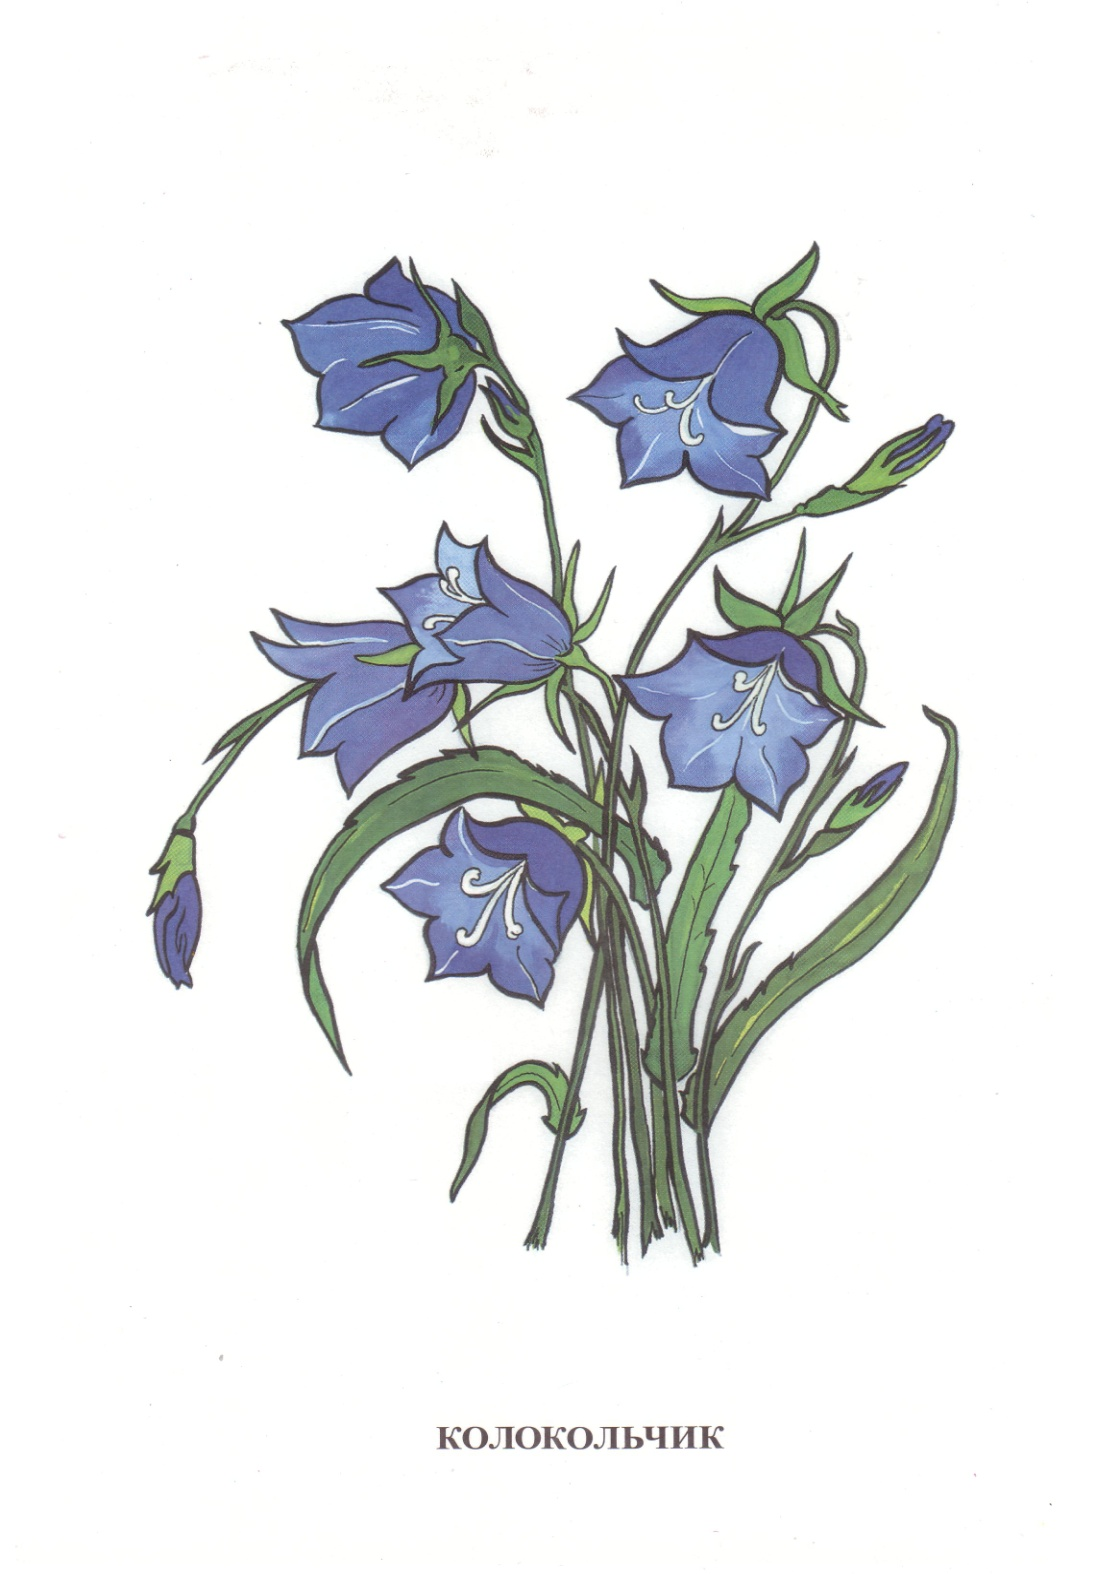 D:\школа 8 вида\Дидакт. материал картинки\Vohrinceva_полевые цветы\Vohrinceva_полевые цветы\1-17.jpg